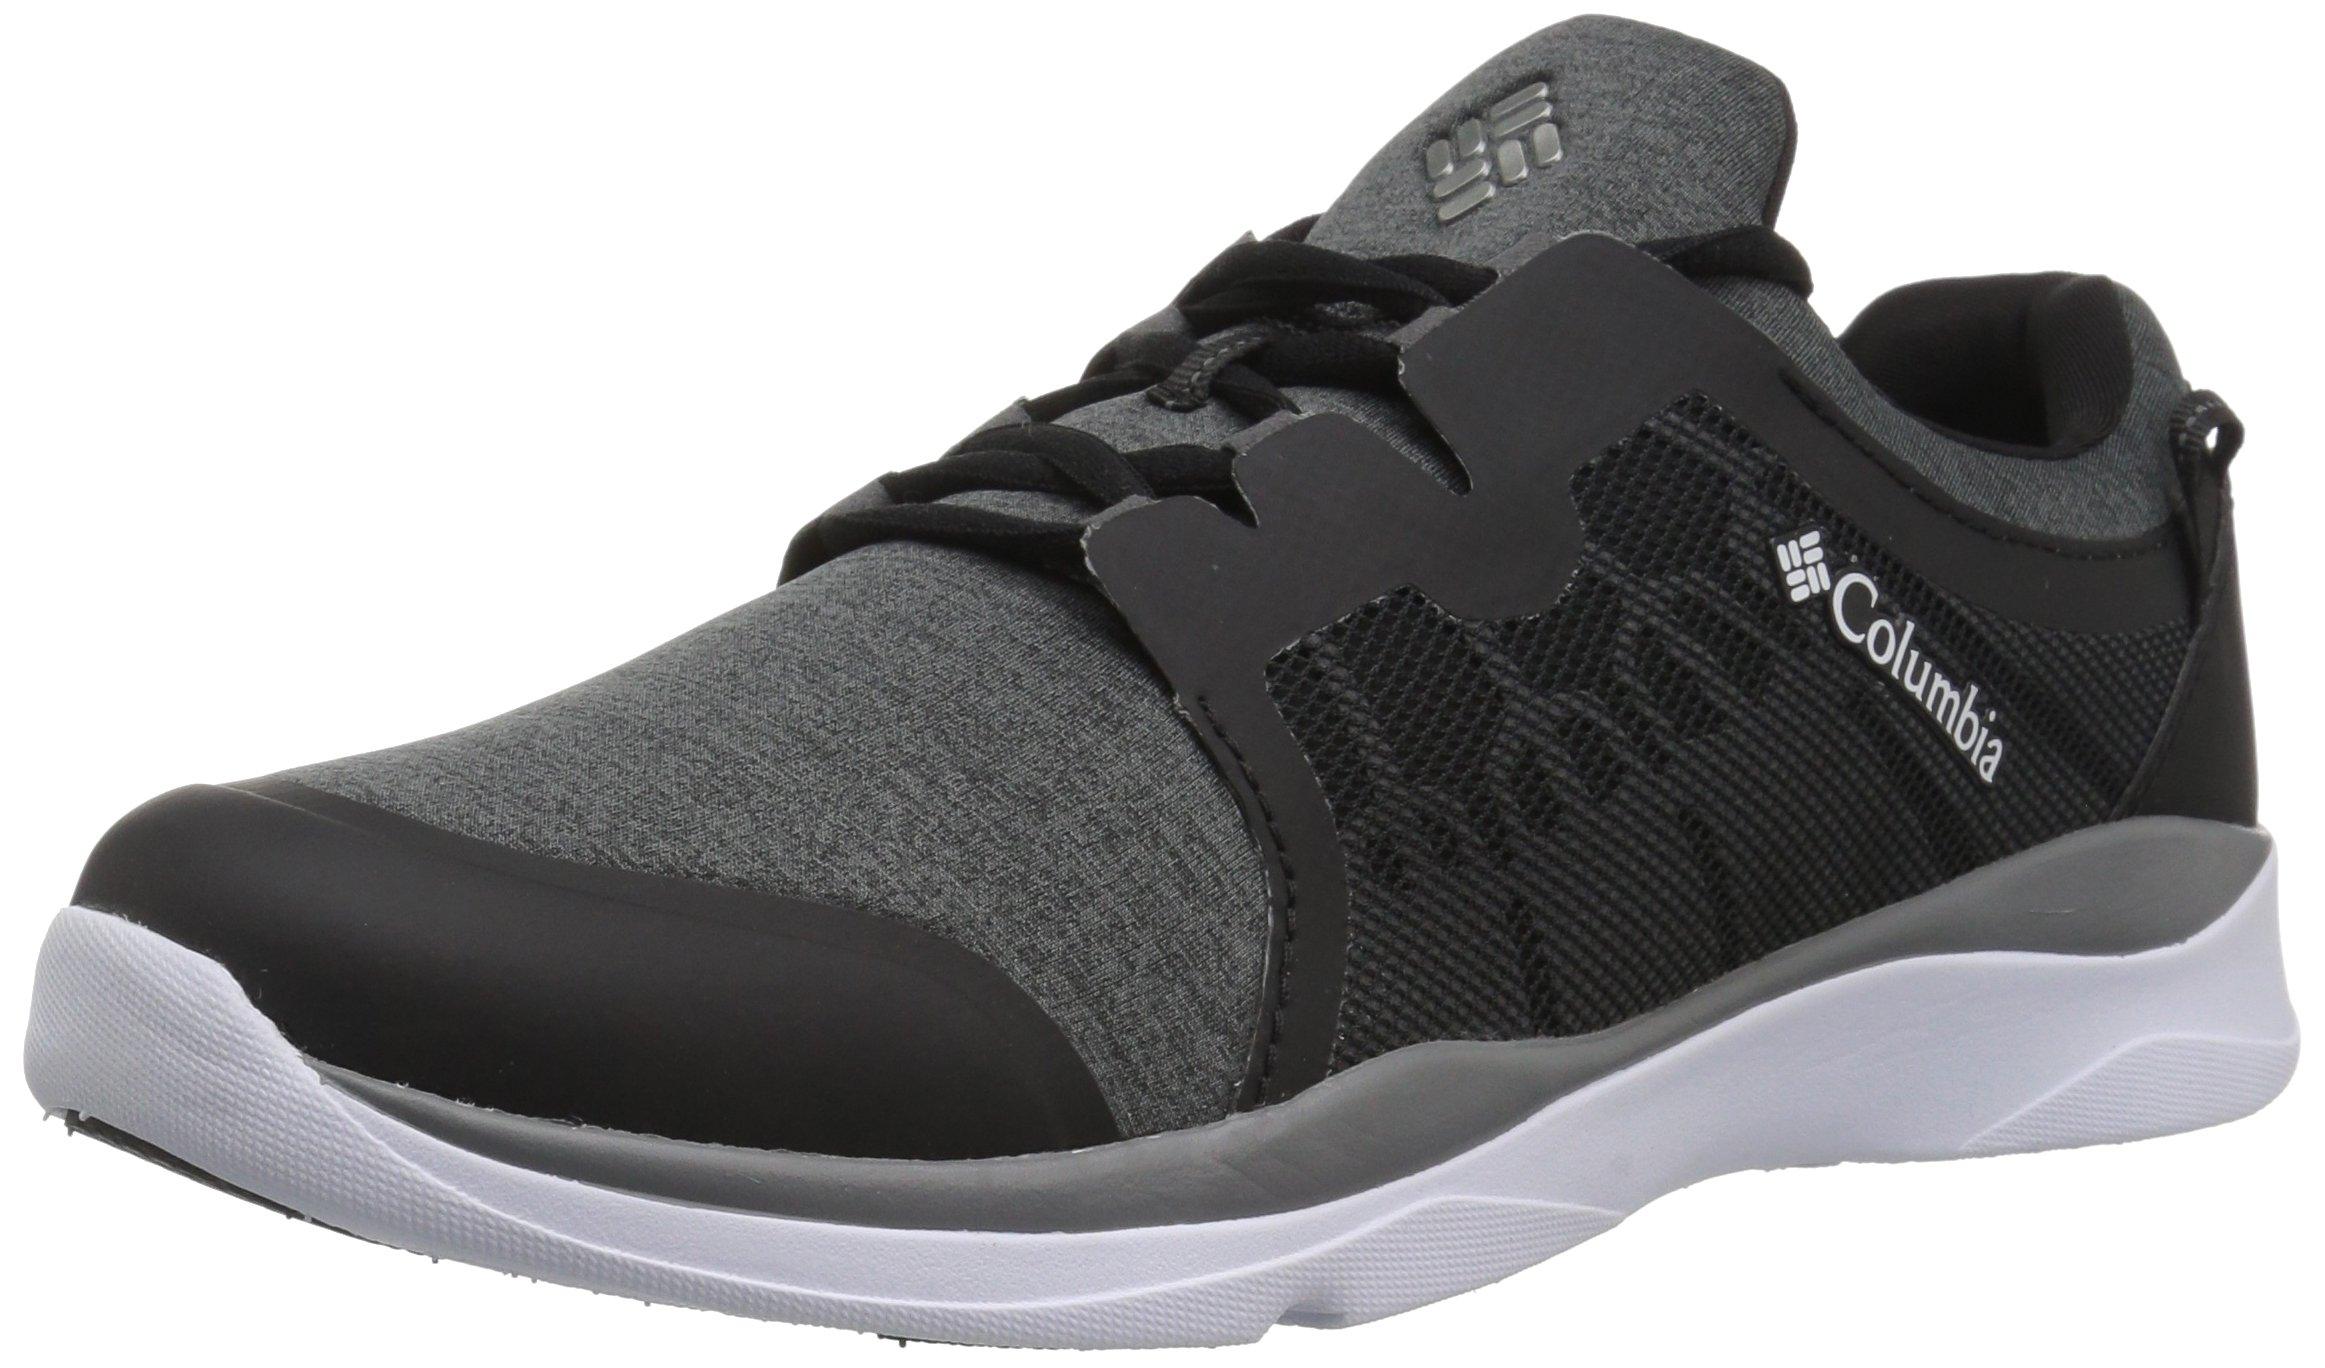 Columbia Women's ATS Trail LF92 Sneaker, Titanium MHW, White, 8.5 Regular US